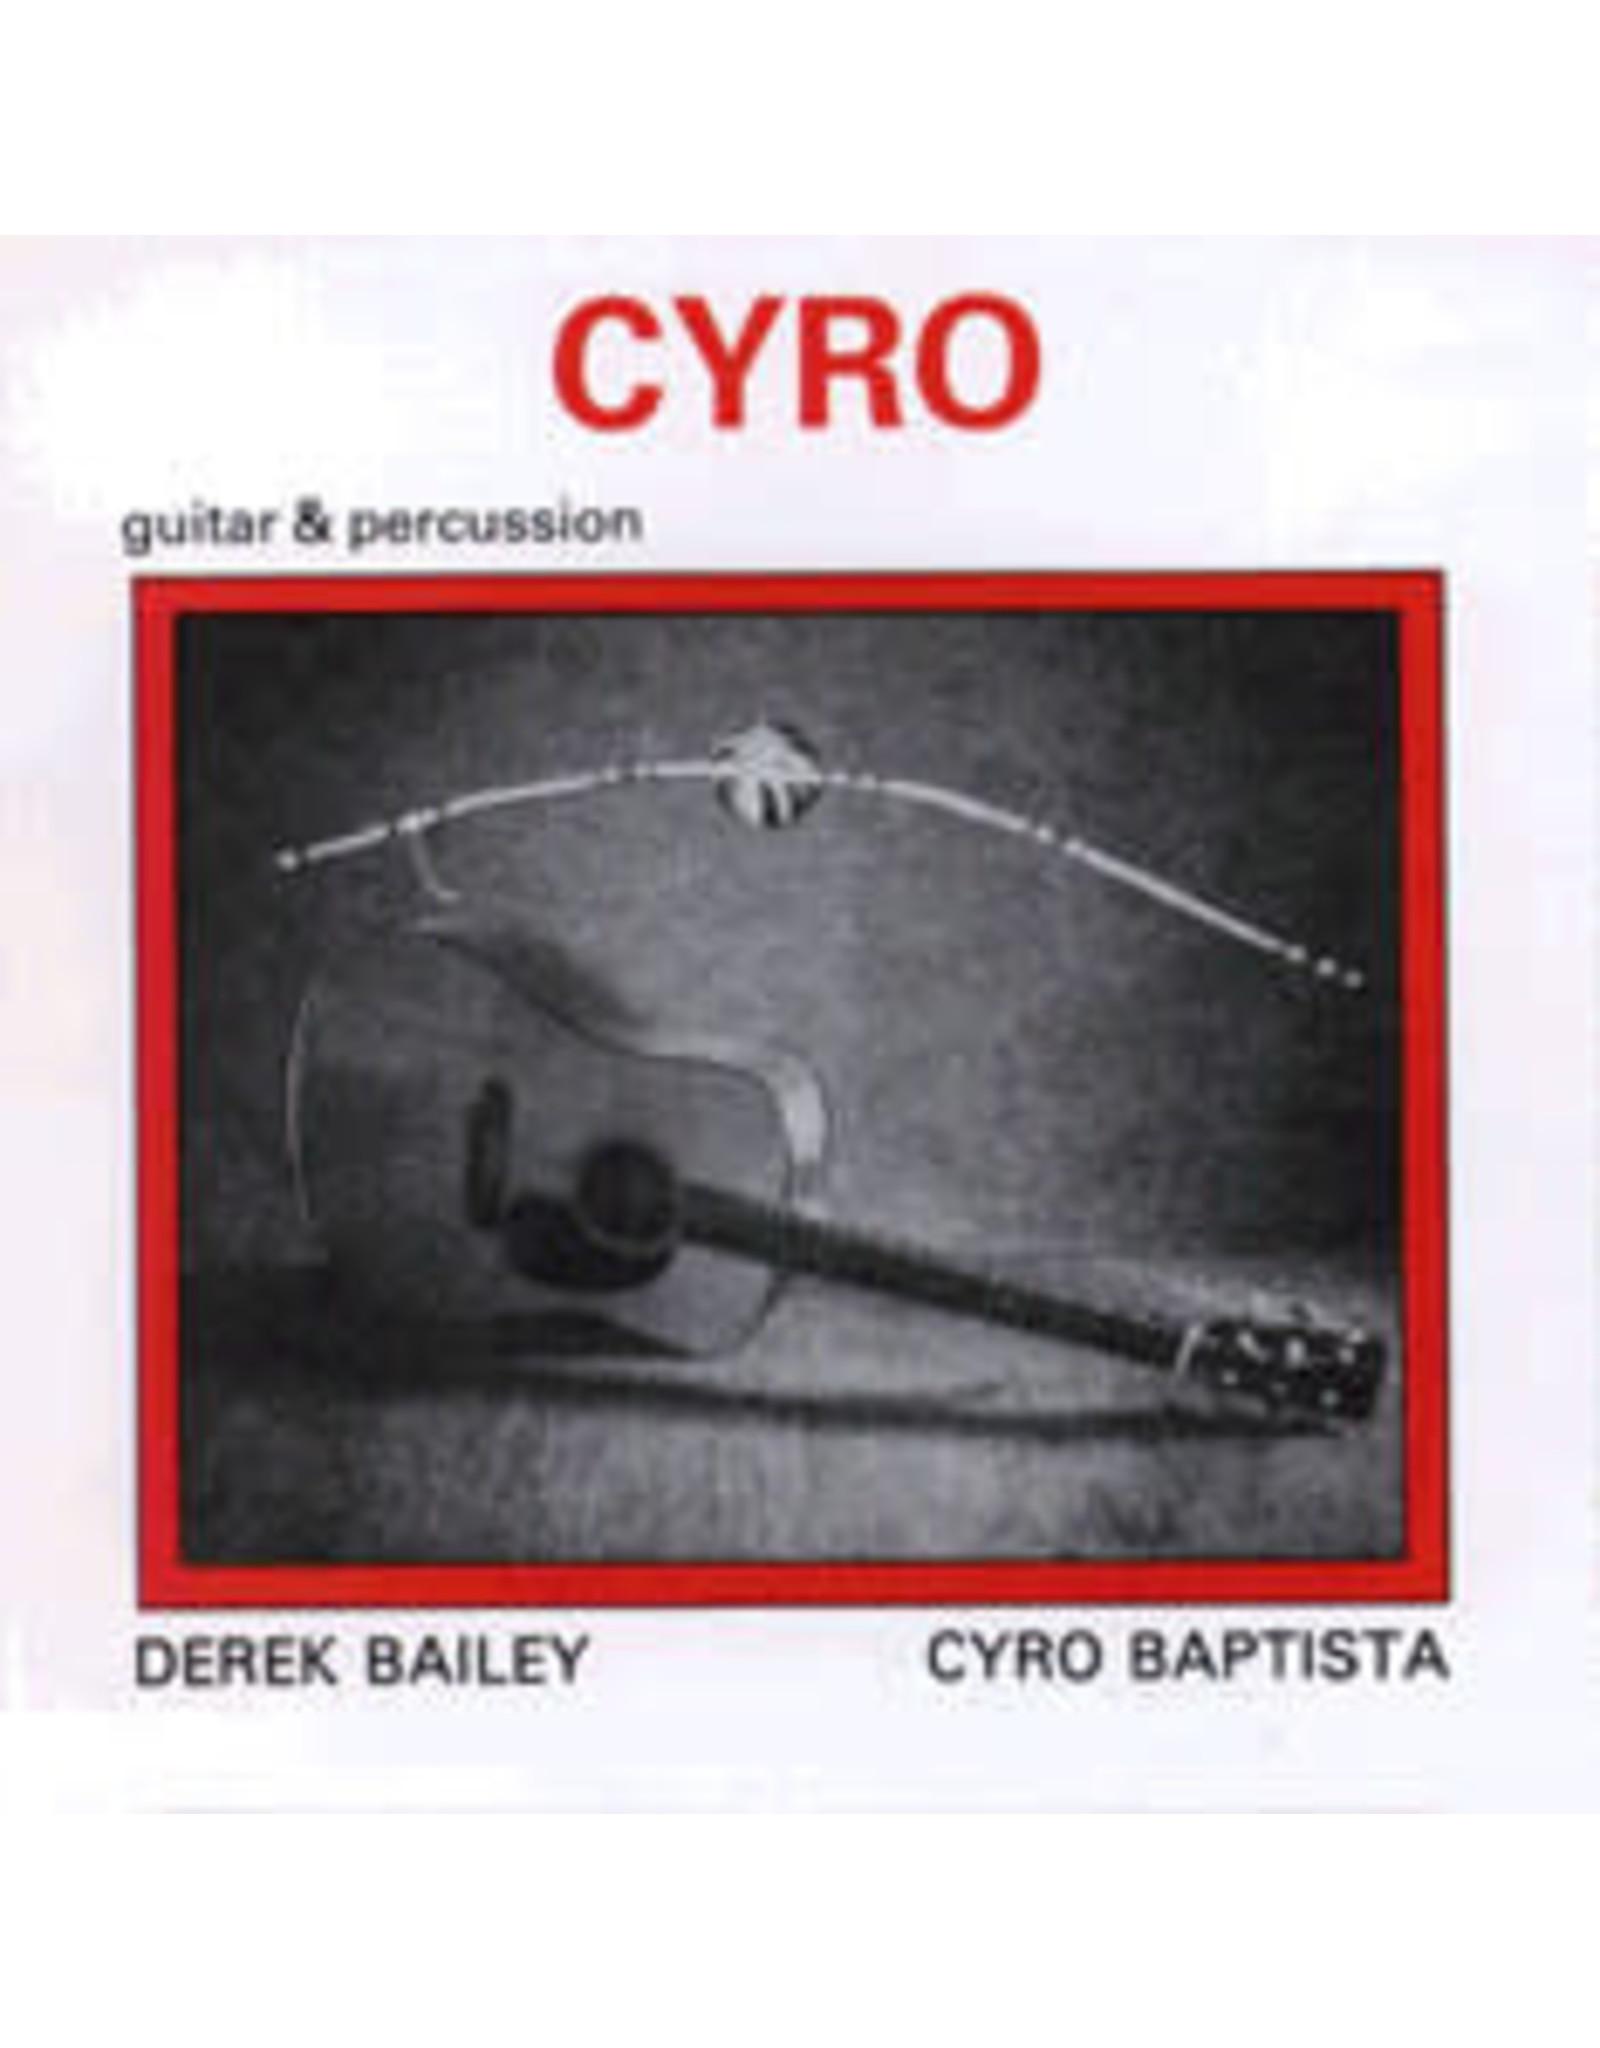 New Vinyl Derek Bailey / Cyro Baptista - Cyro 2LP